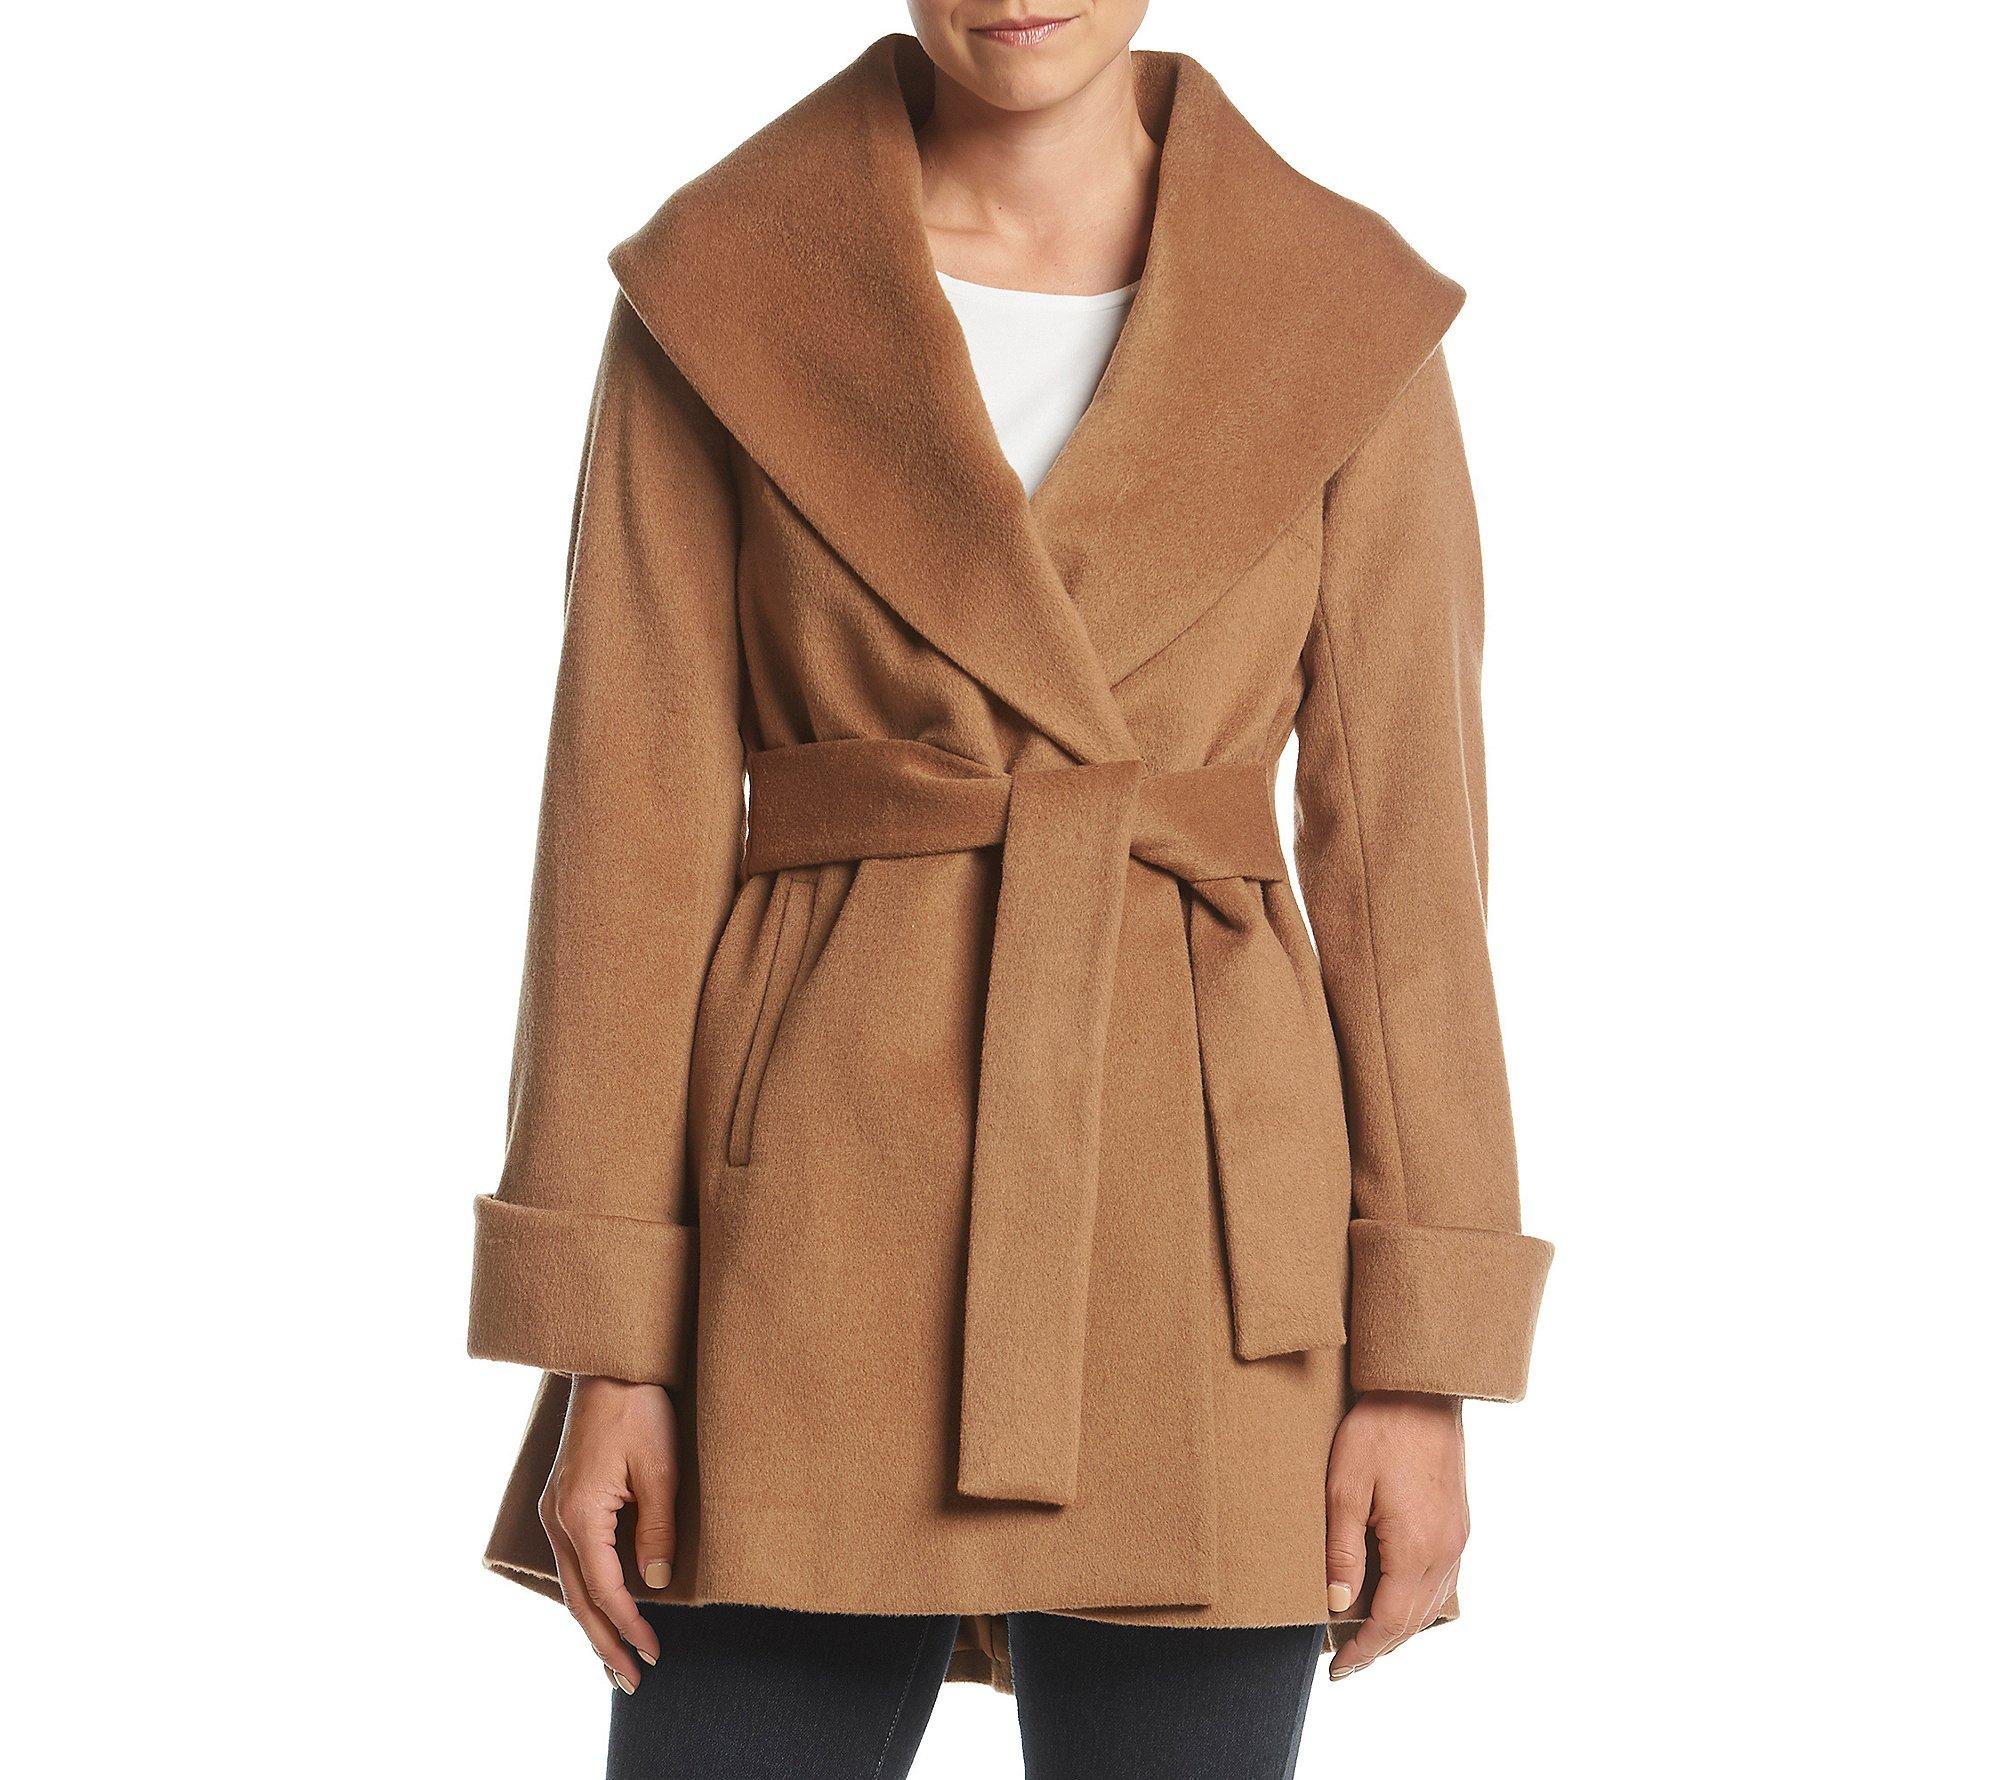 Trina Turk Asymmetric Shawl Collar Wrap Jacket Camel 4